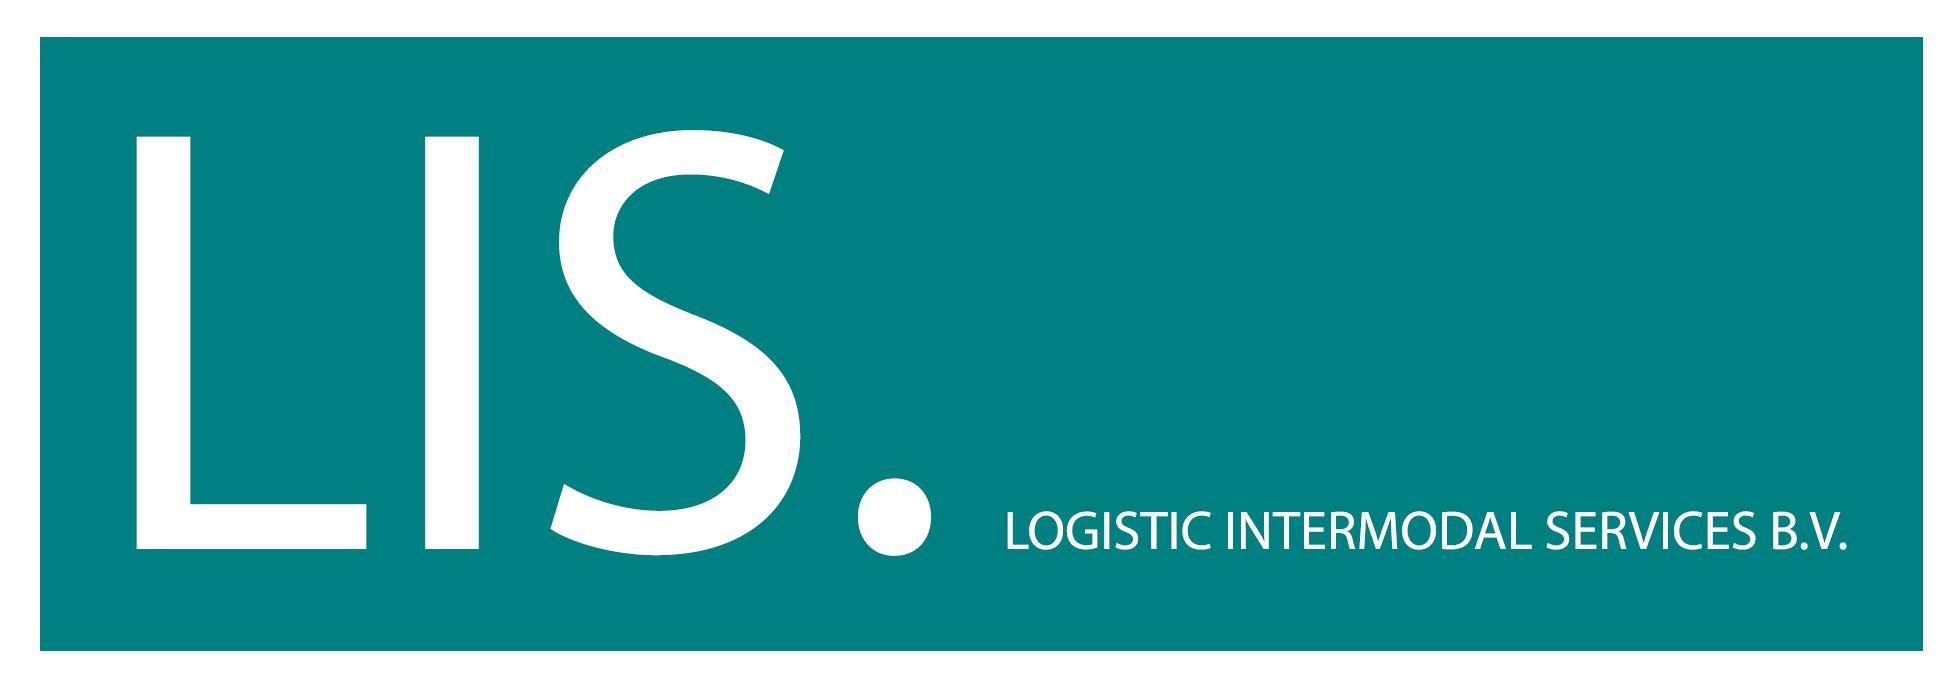 LIS - Logistic Intermodal Services B.V.